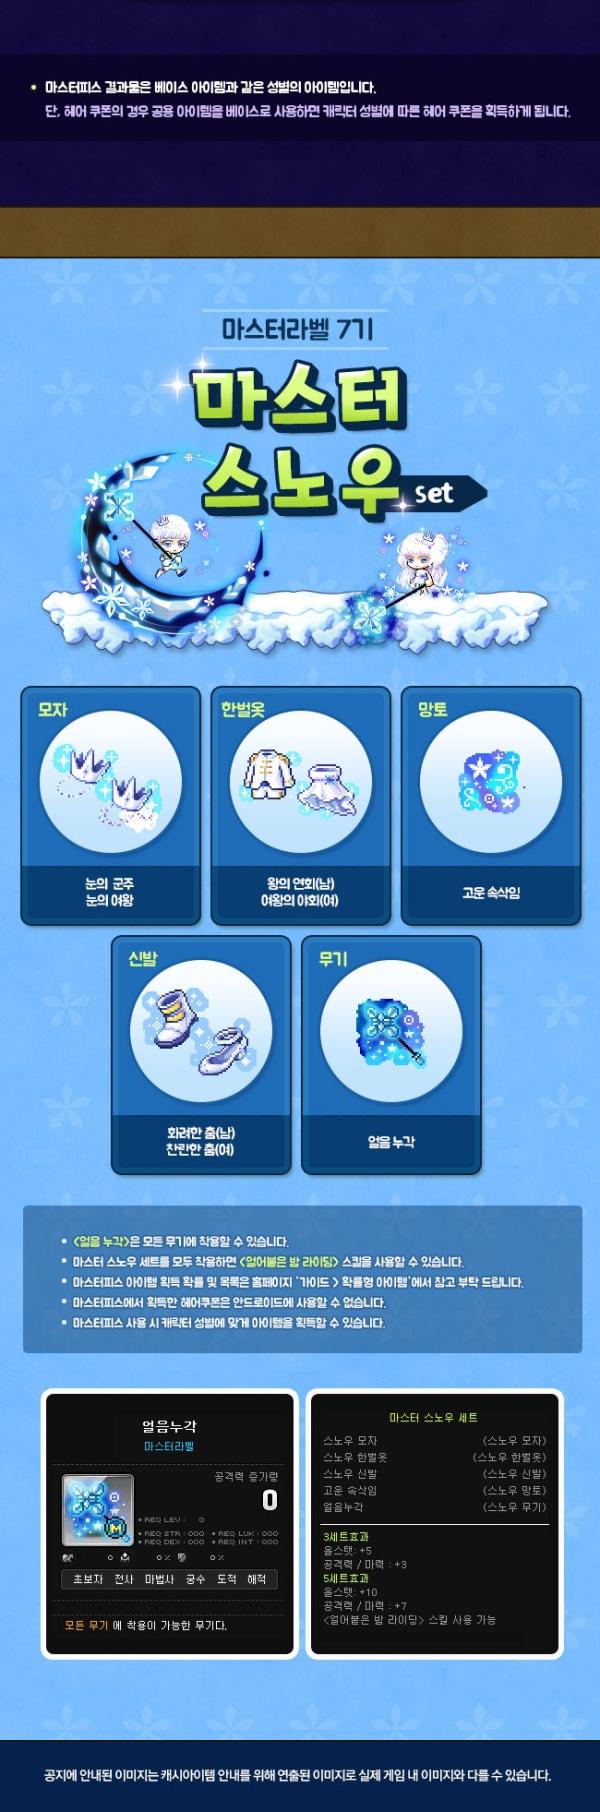 master-snow-set.jpg?w=600